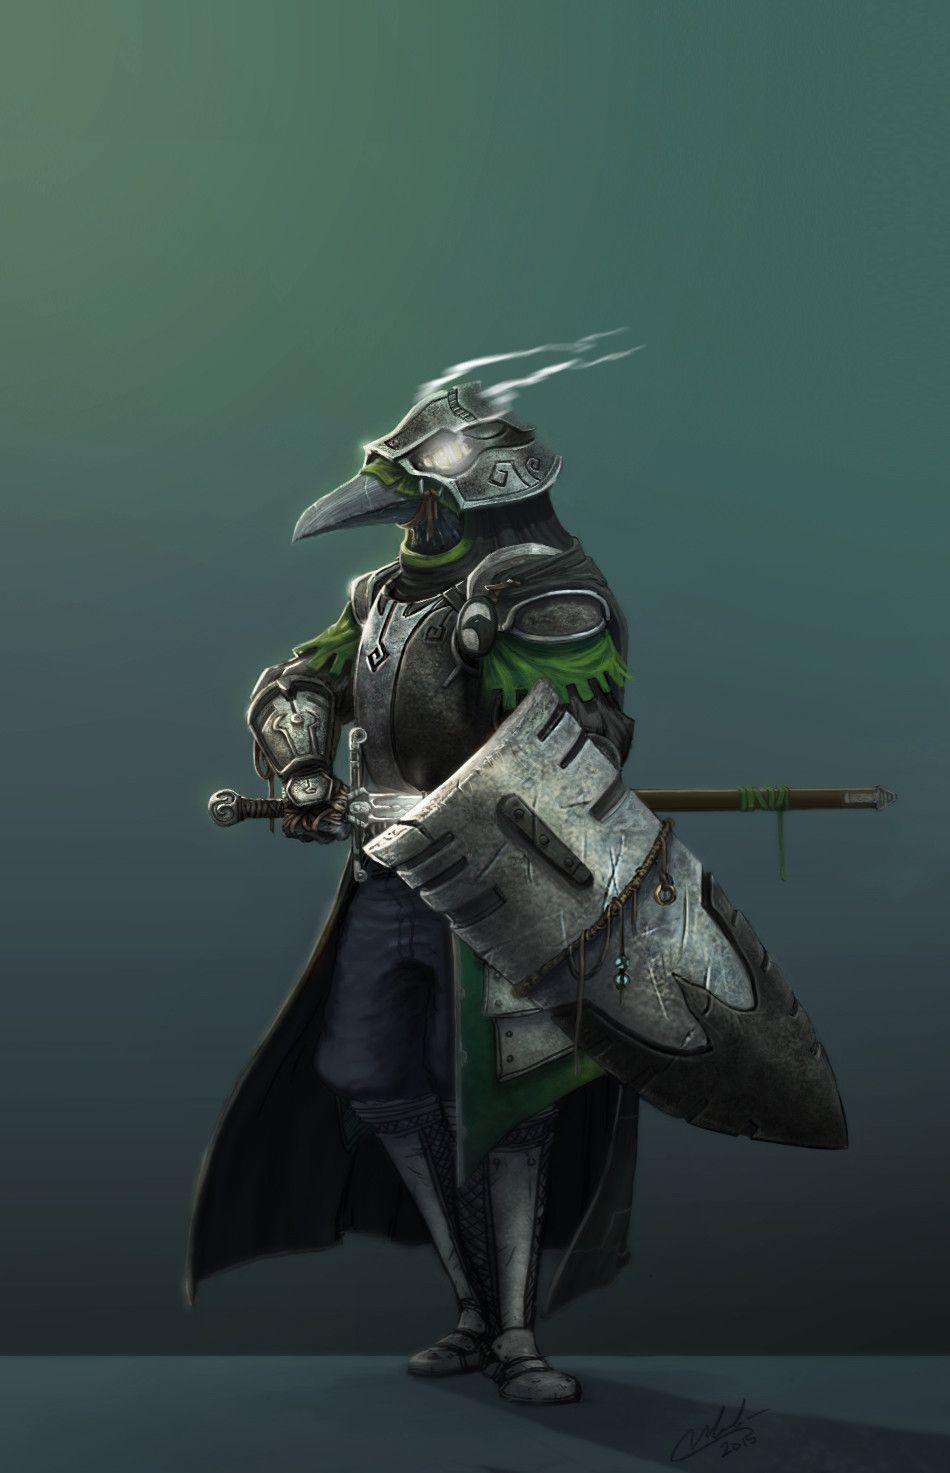 Pin By Chris Dsouza On Samurai Warriors In 2019 Fantasy